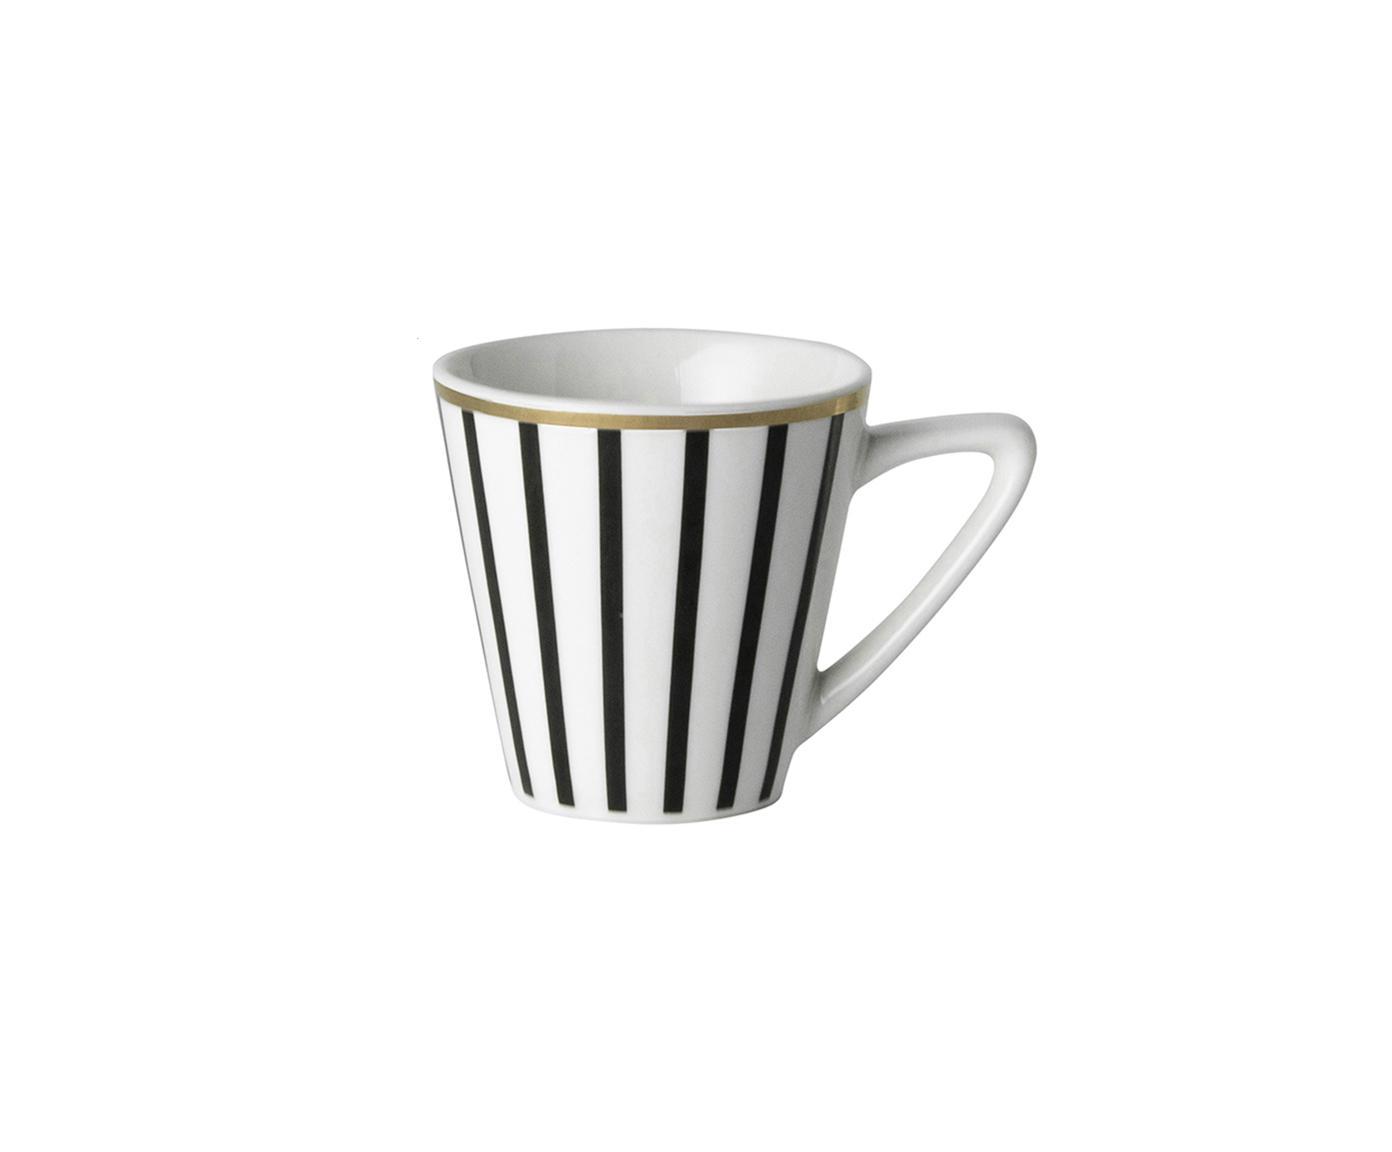 Tazza da caffè Pluto Loft, 4 pz., Porcellana, Nero, bianco, Ø 6 x Alt. 6 cm